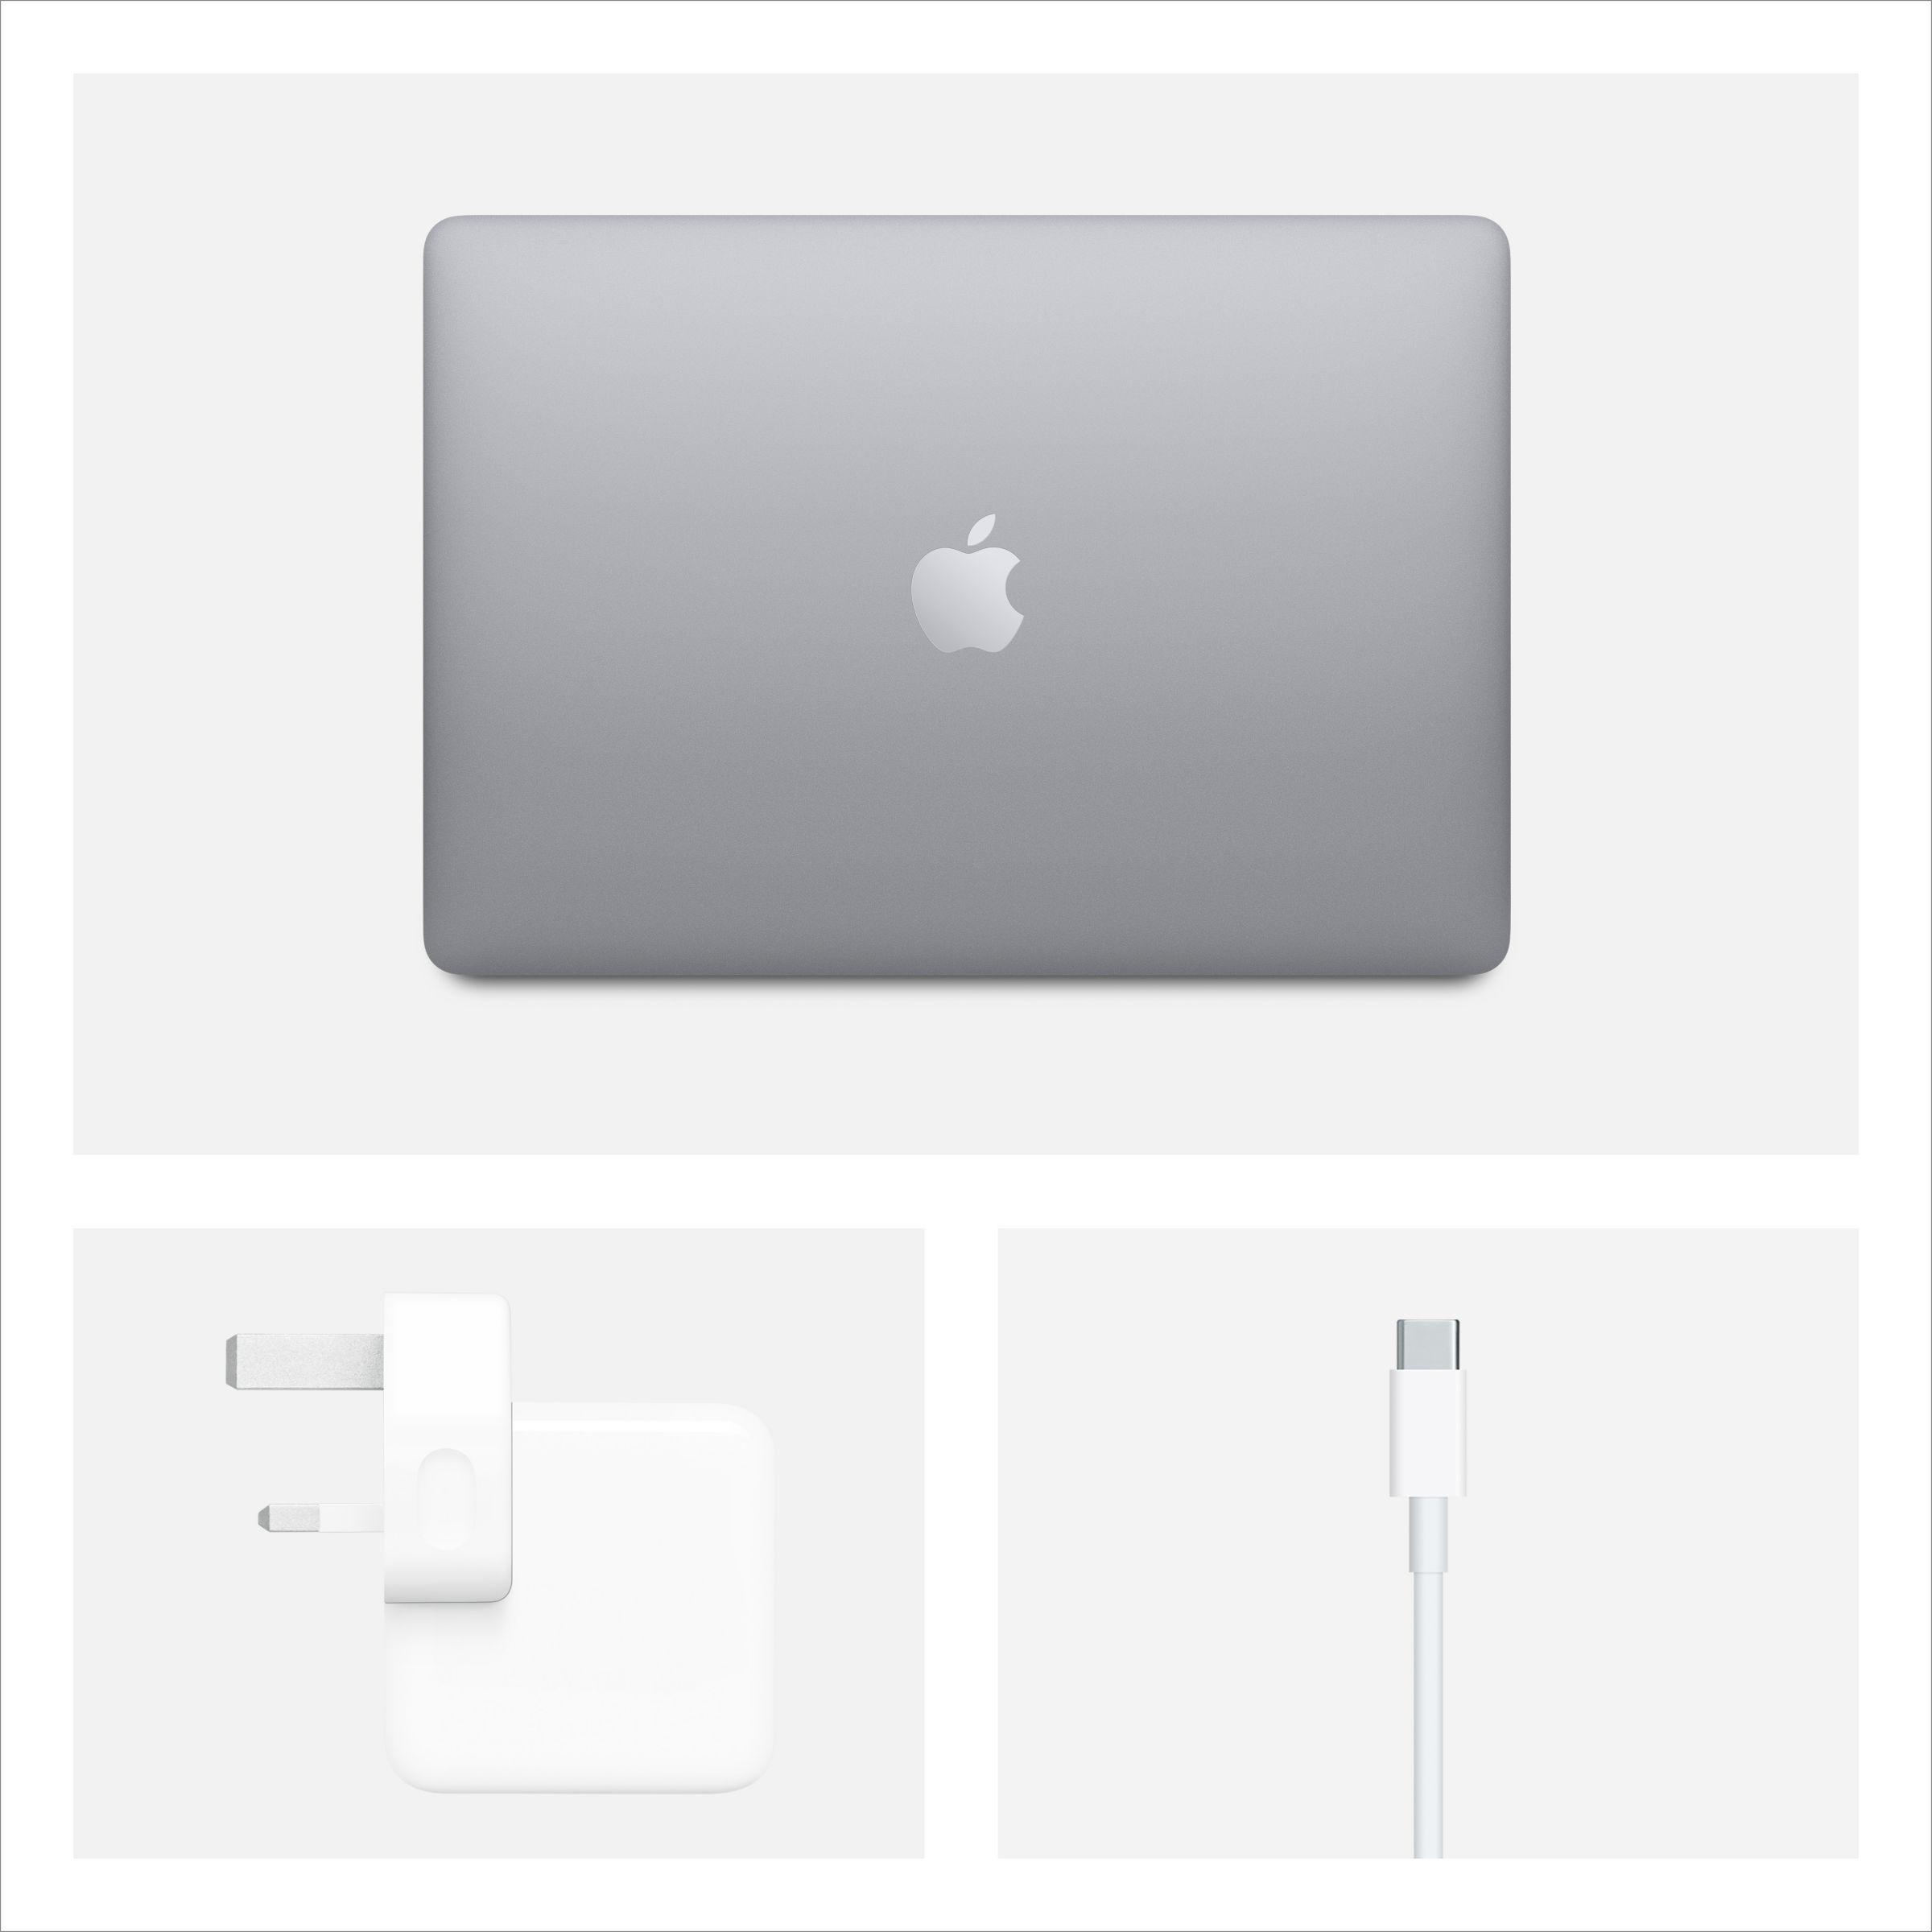 "2020 Apple MacBook Air 13.3"" Retina Display, Intel Core i3"